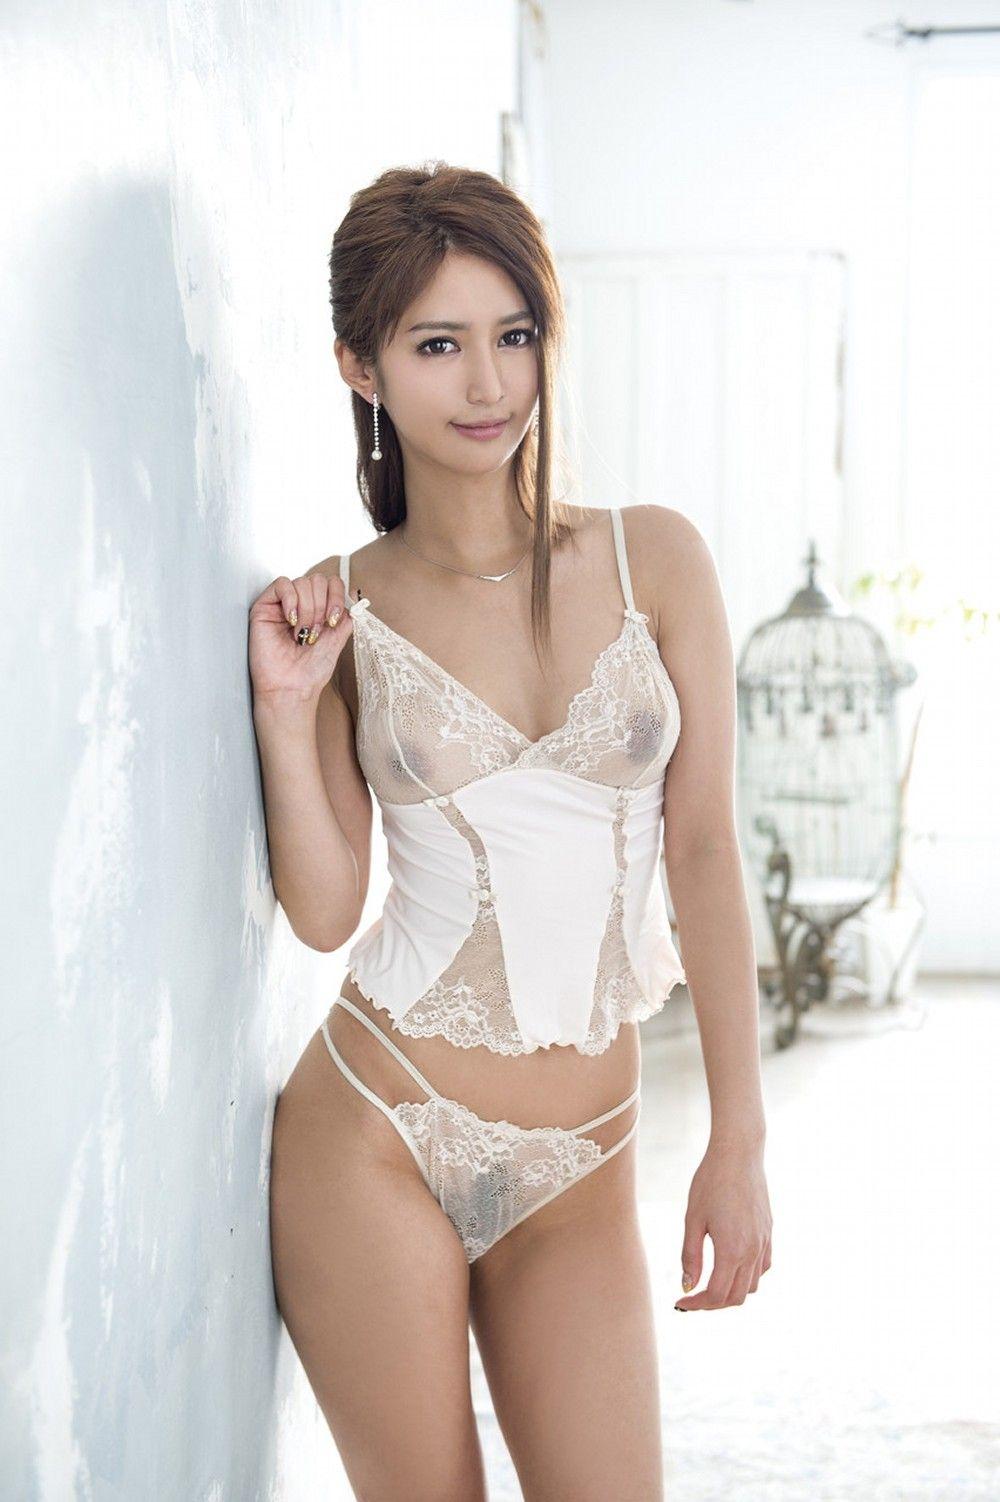 Topless Jestina Lam nude (49 photo), Ass, Cleavage, Feet, panties 2006